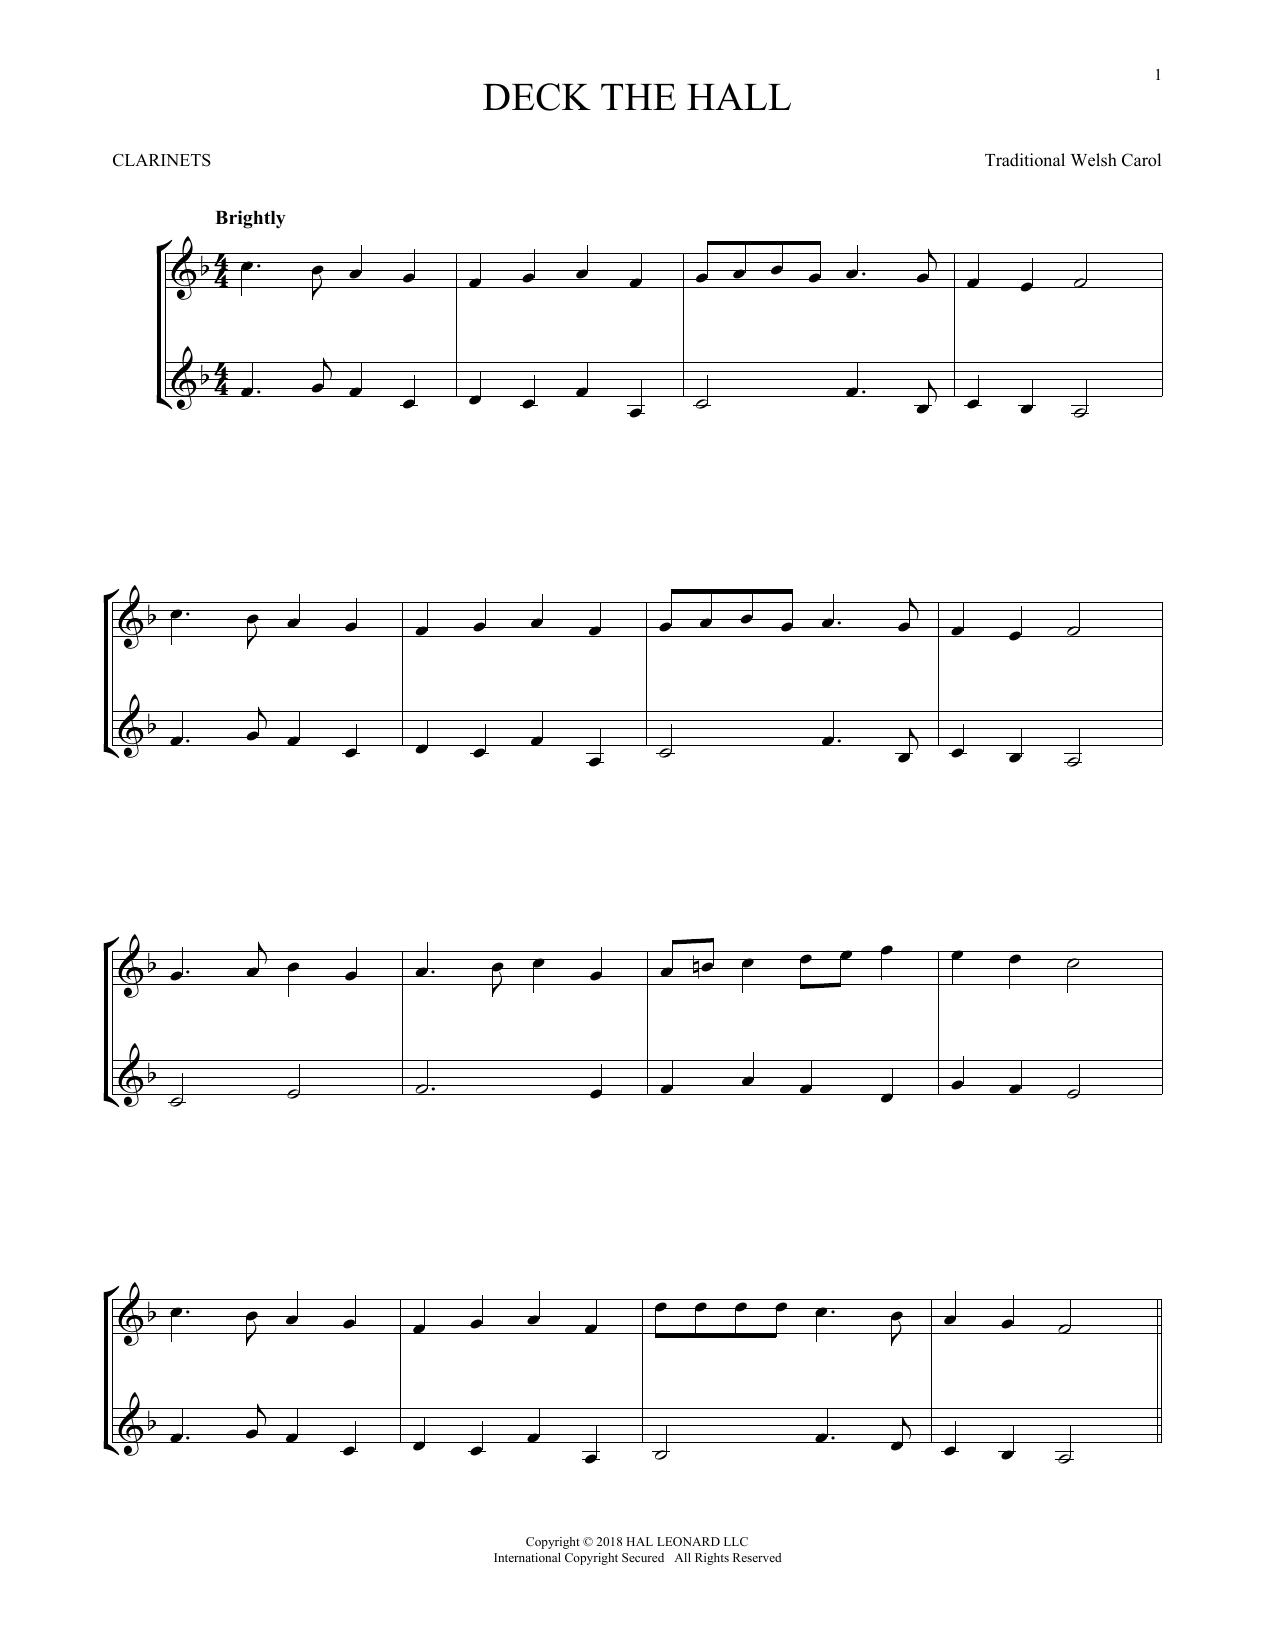 Deck The Hall (Clarinet Duet)